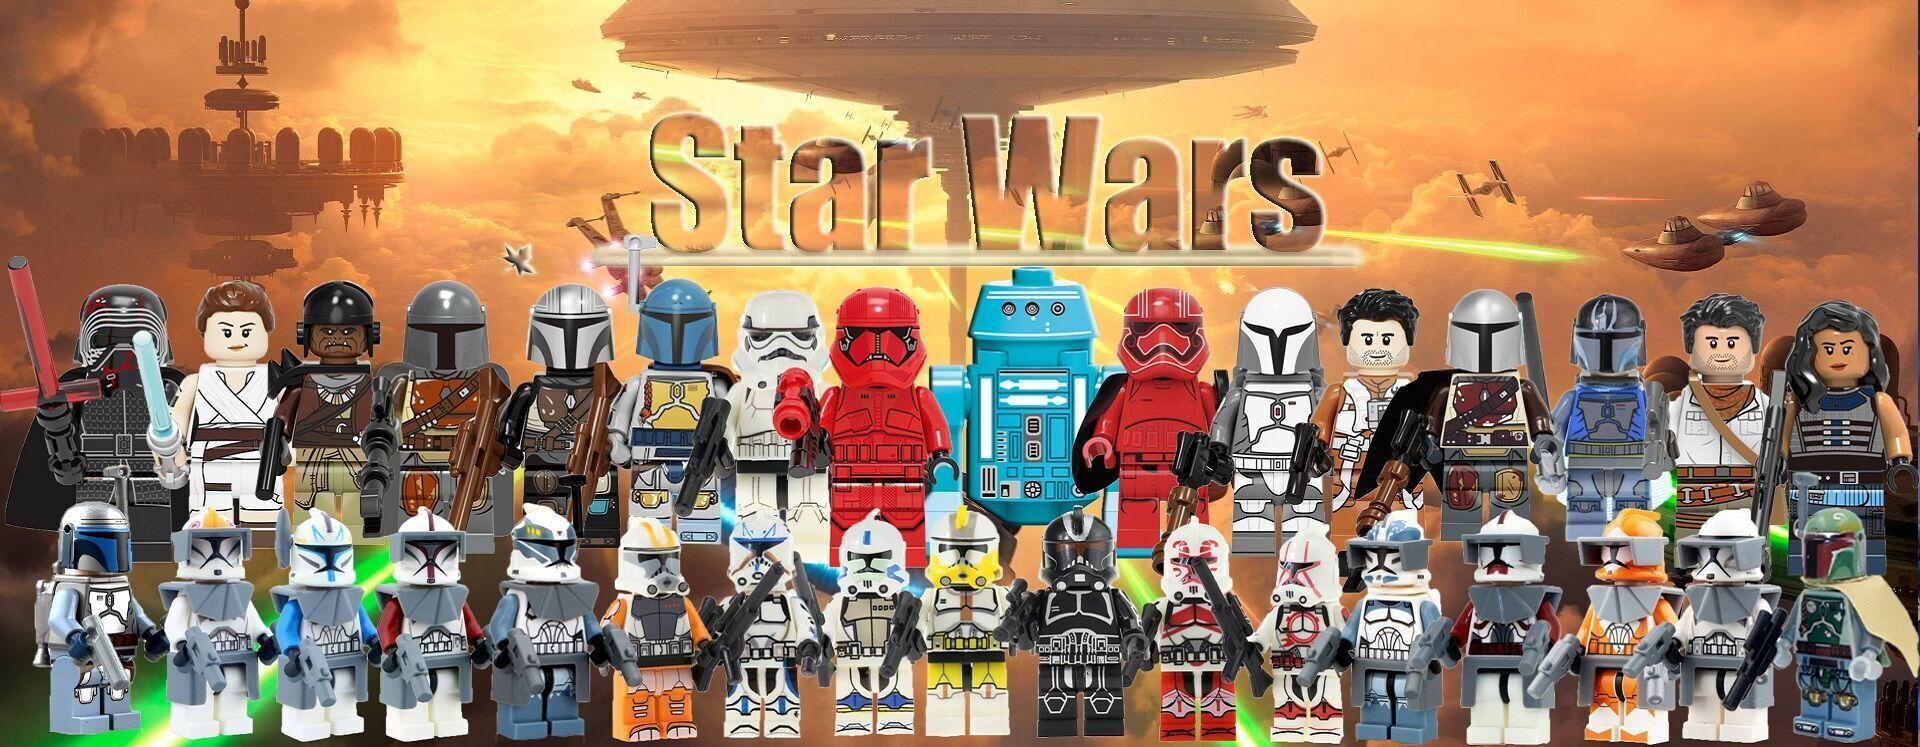 Custom Black Sun Syndicate Soldier star wars minifigures black on lego bricks